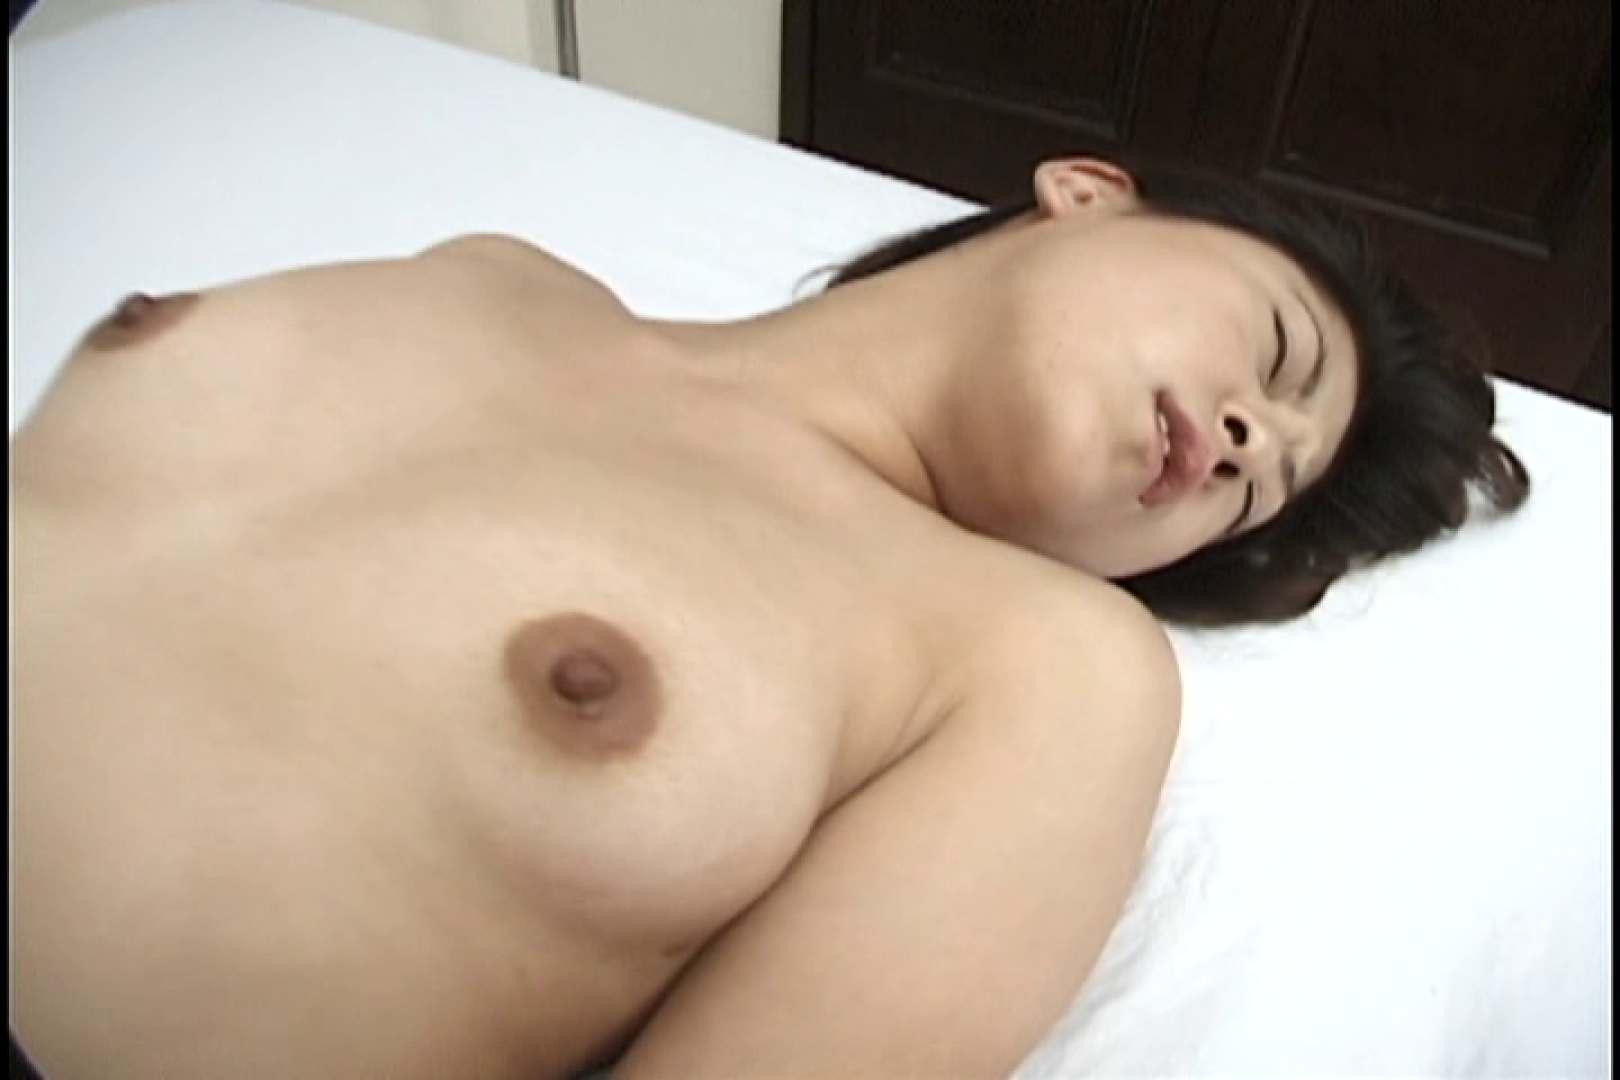 昼間の奥様は欲求不満 ~江口亜紀子~ 熟女  54連発 47